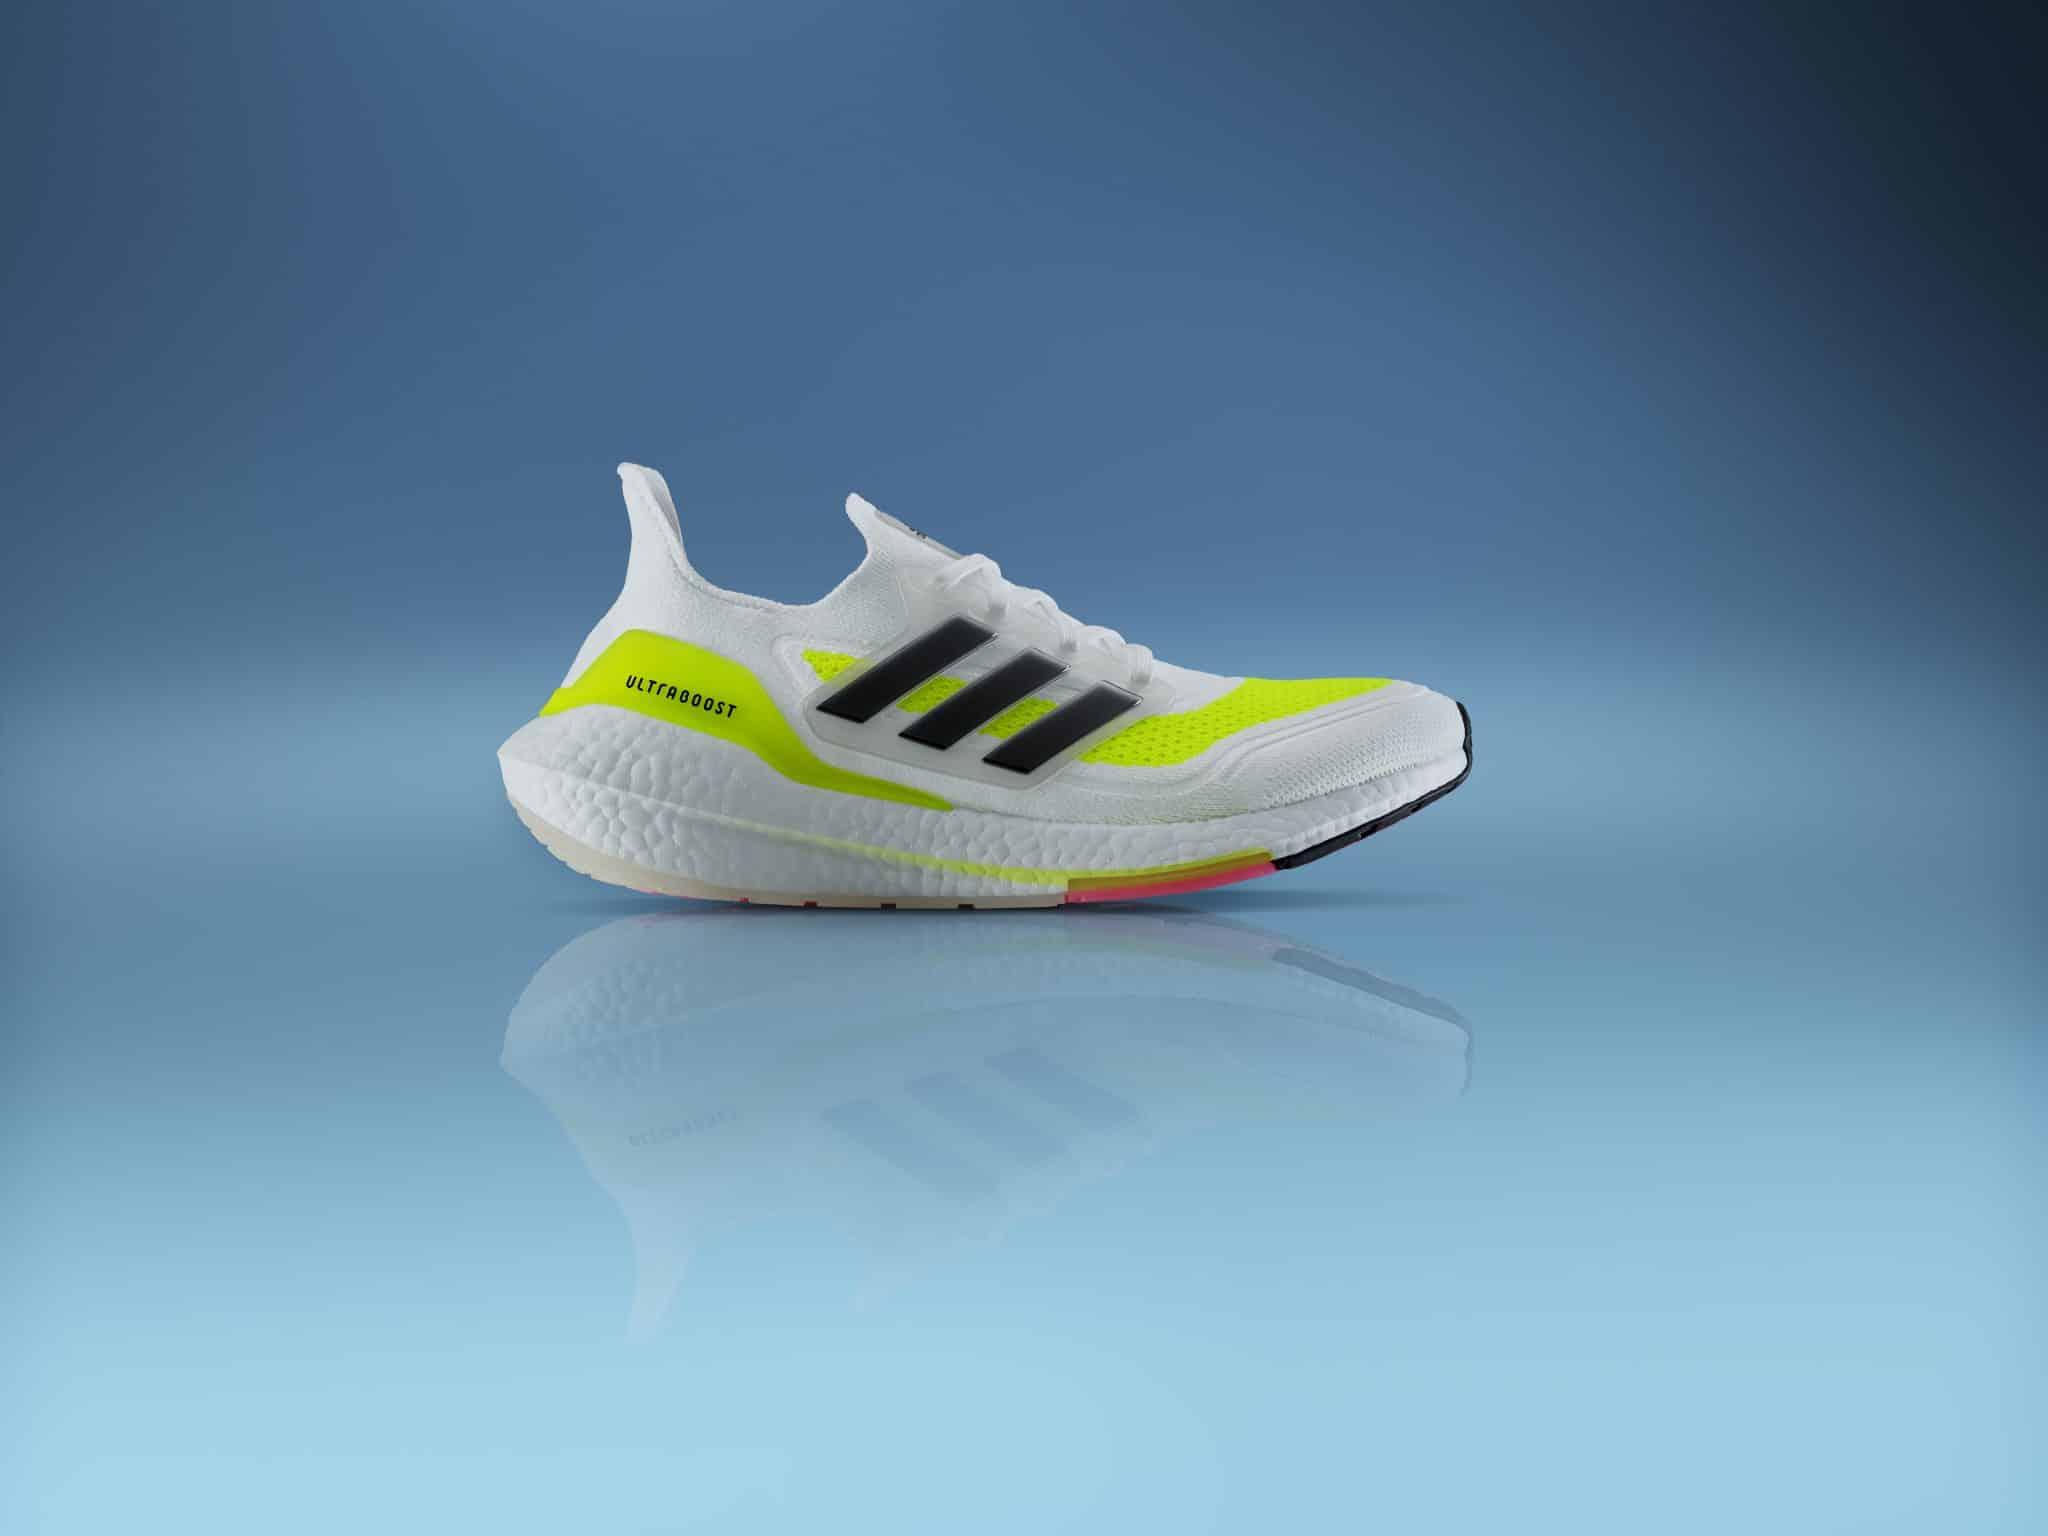 Adidas Ultraboost 21 : le test